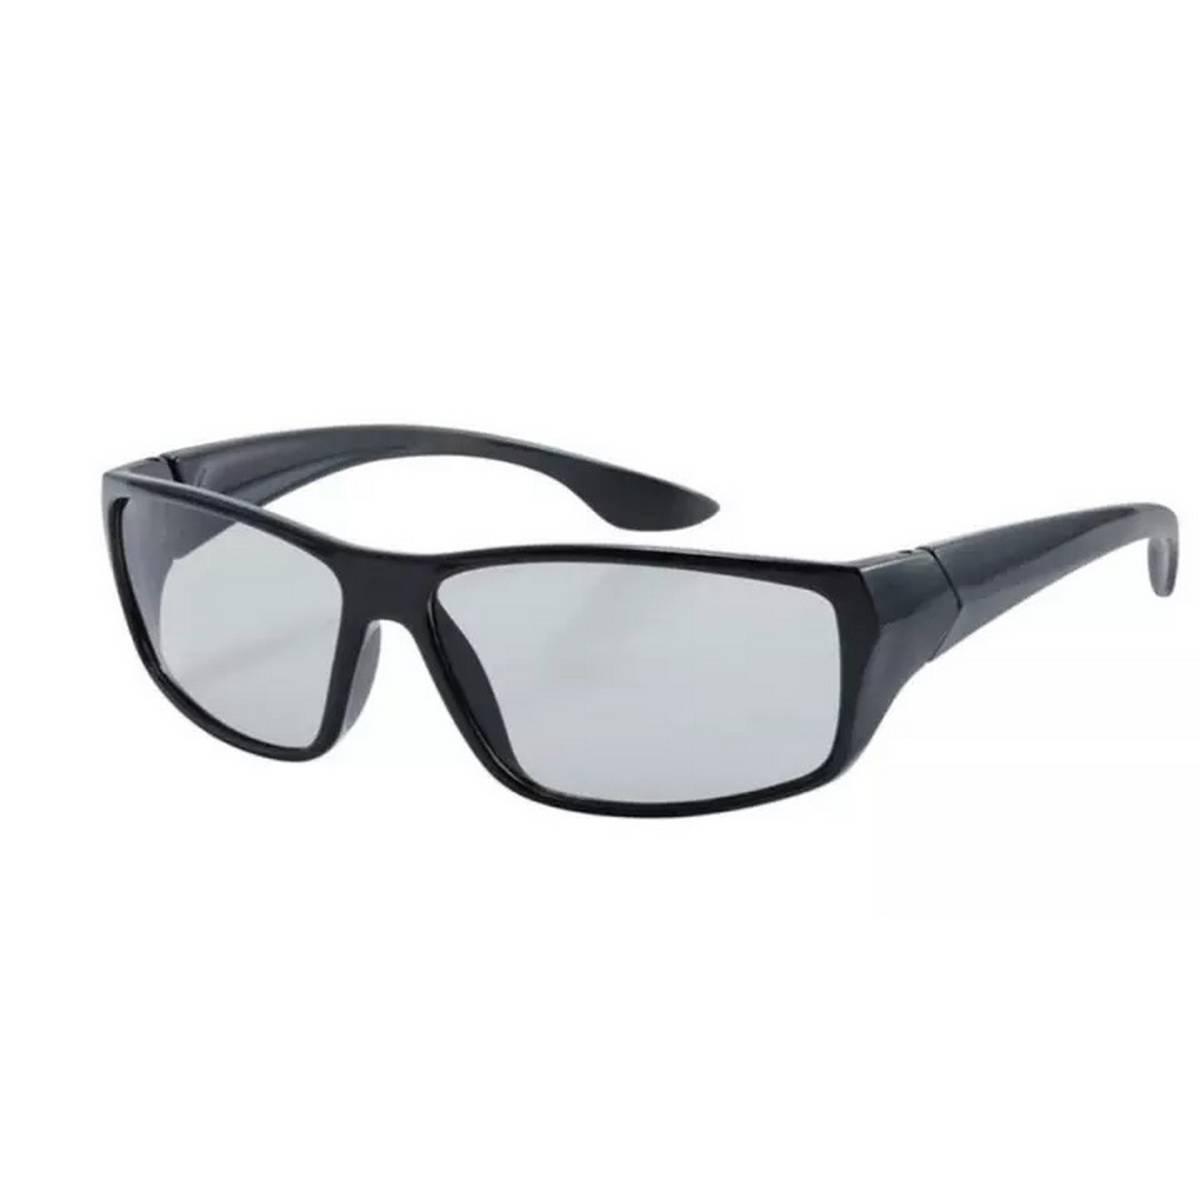 Passive 3D Glasses, Plastic Circular Polarized Real D 3D Glasses for 3D Passive TVs&RealD 3D Cinemas Movies